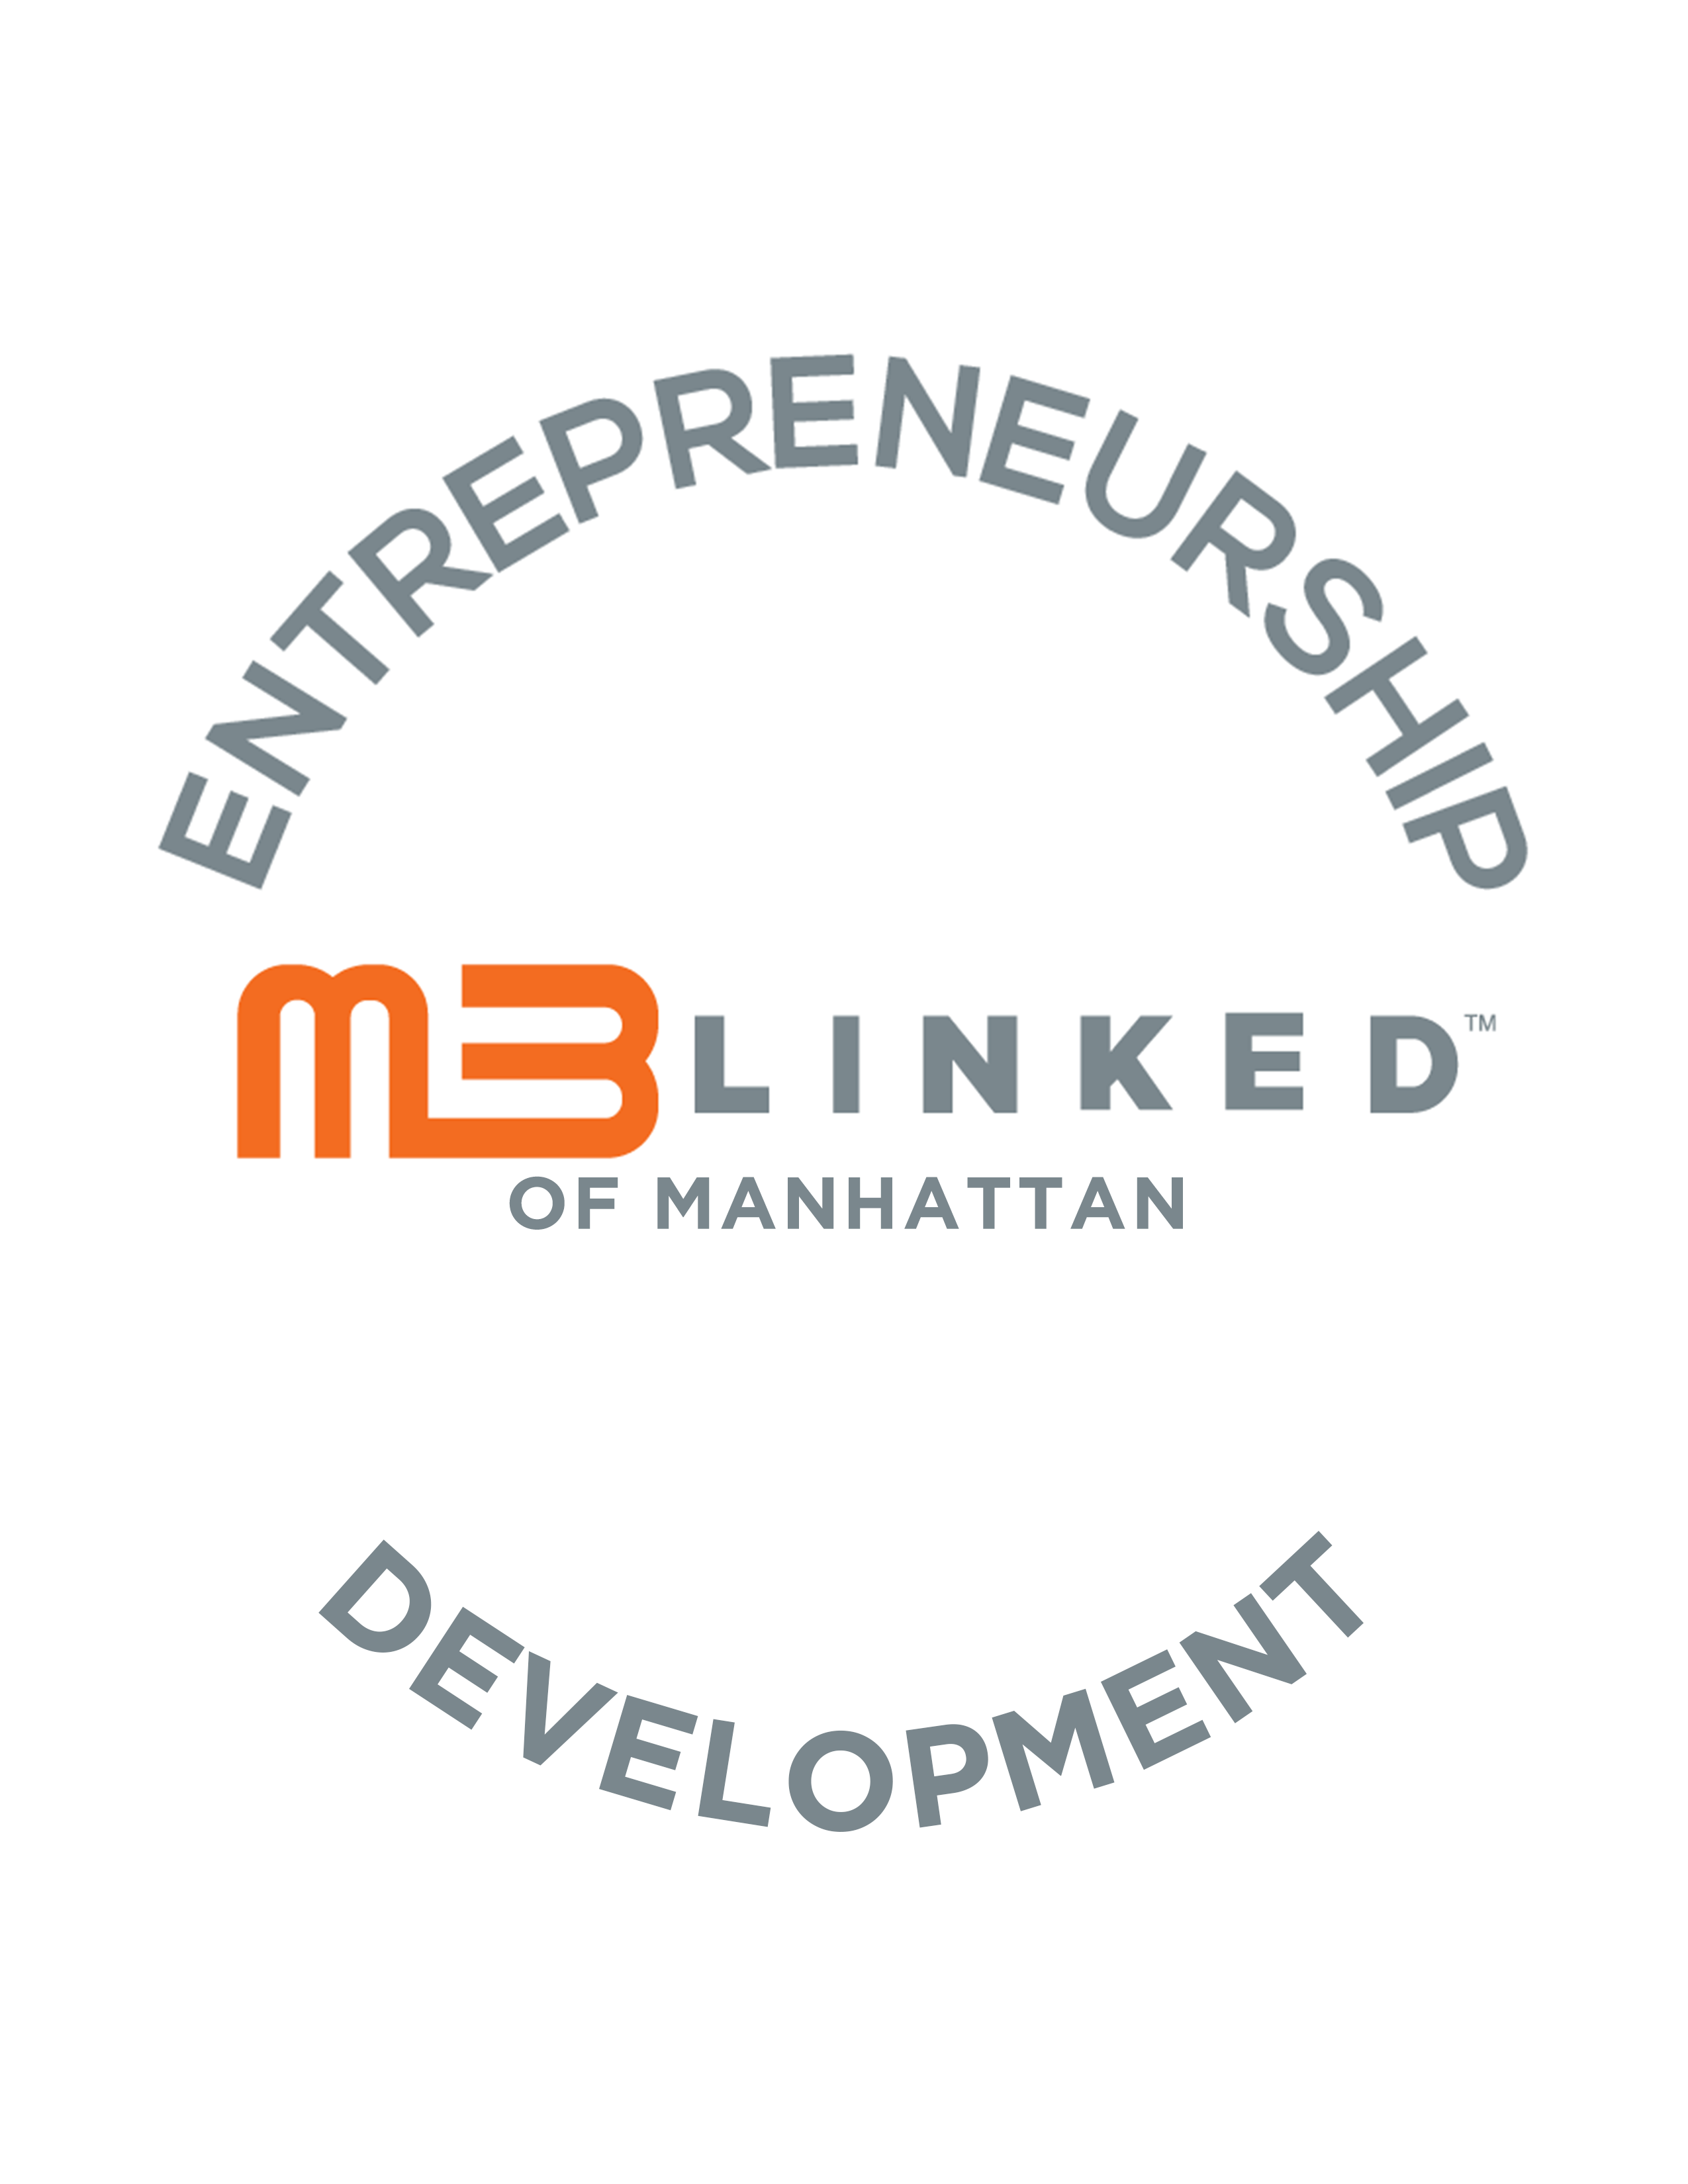 Revolutionary New Company M3Linked Entrepreneurship Development Of Manhattan Helps Businesses Evolve Through Virtual Networking & Business Collaboration